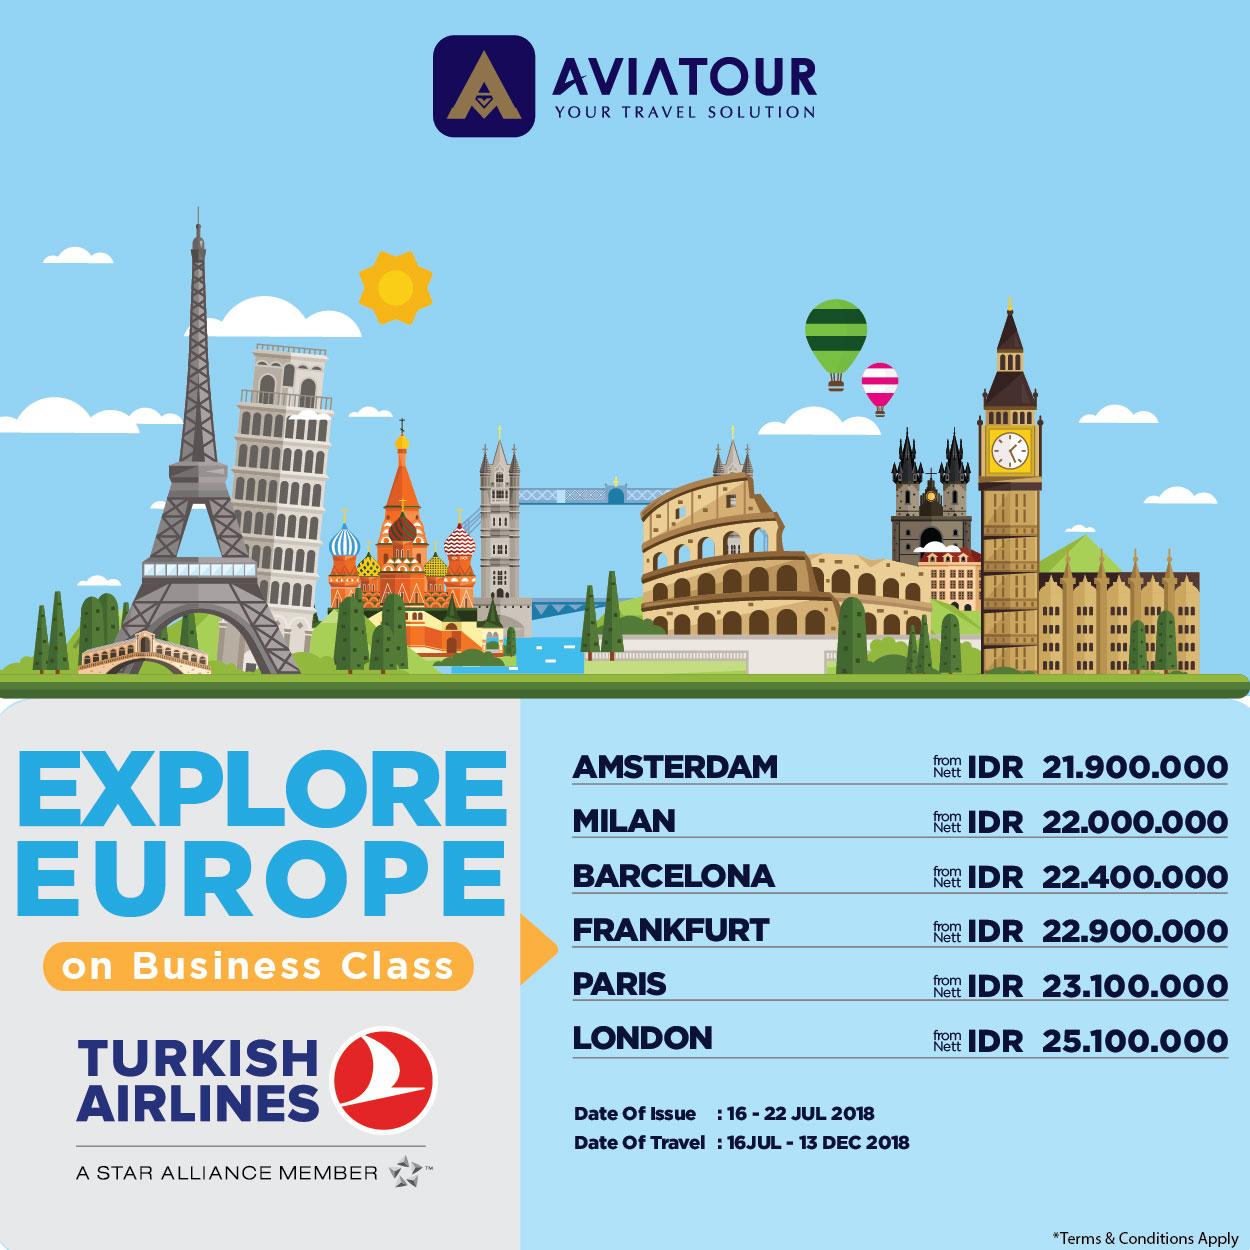 TURKISH BUSINESS